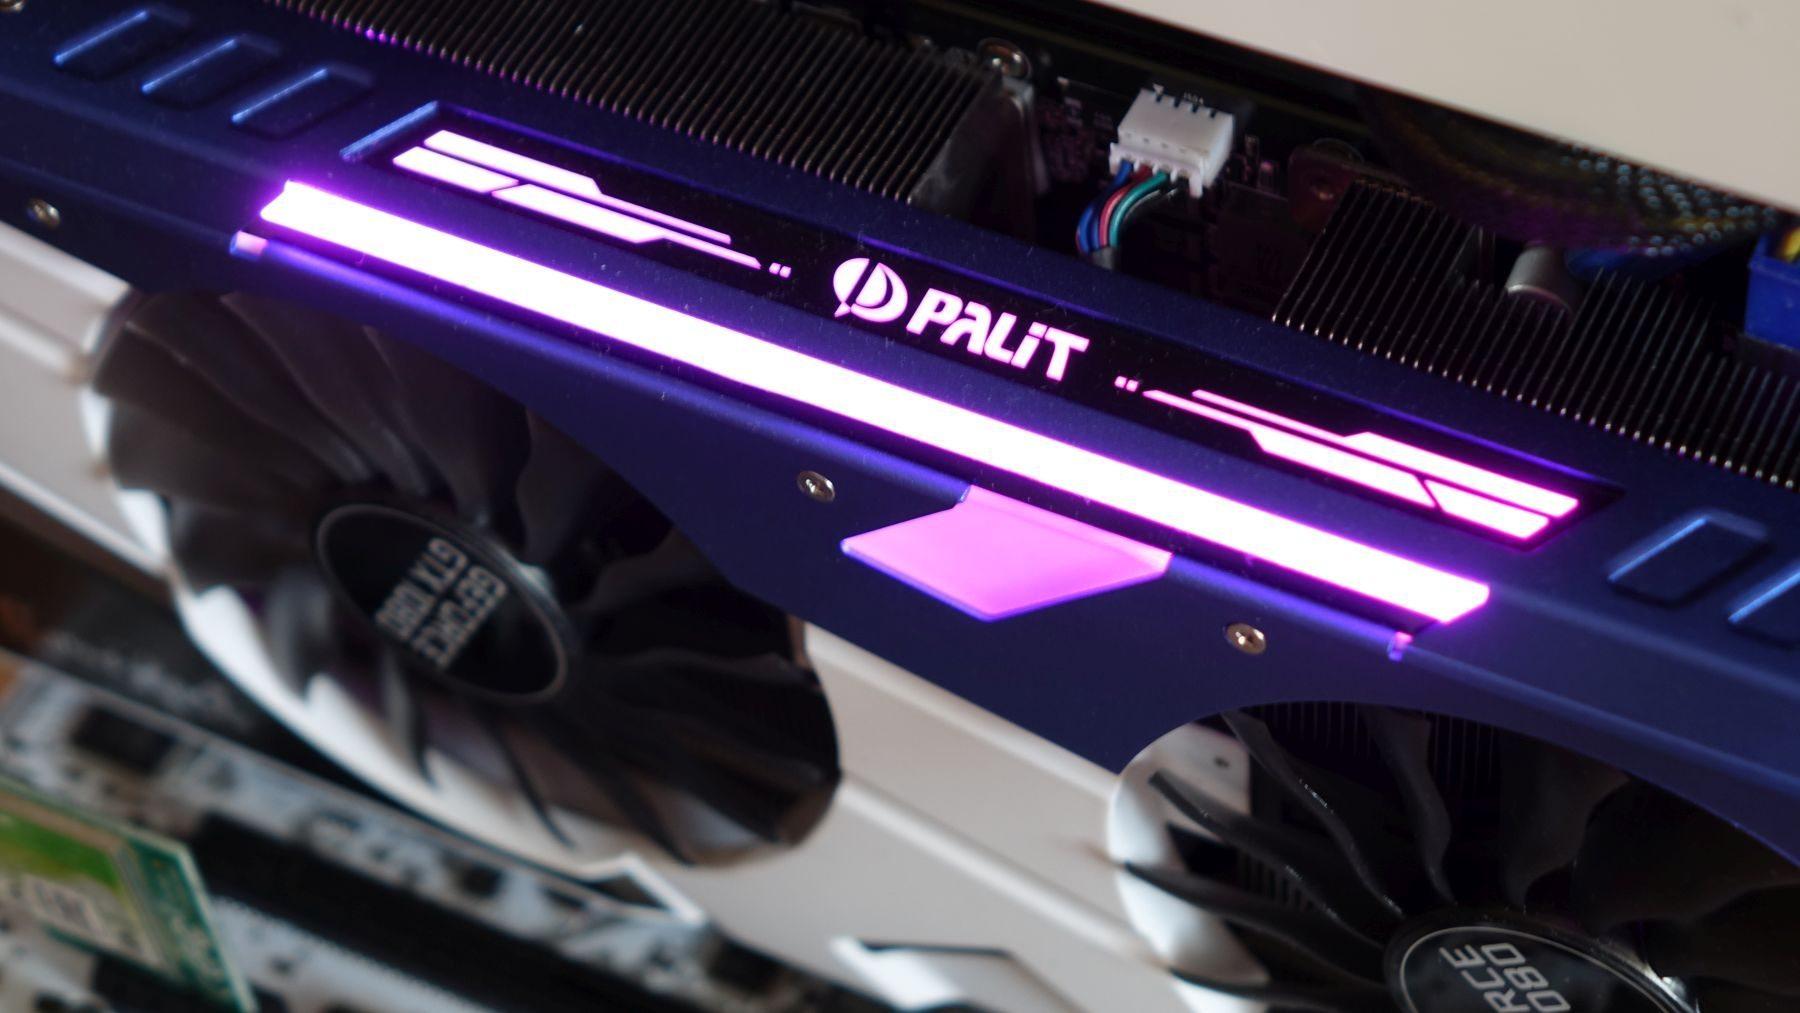 Palit GeForce GTX 1080 GameRock led